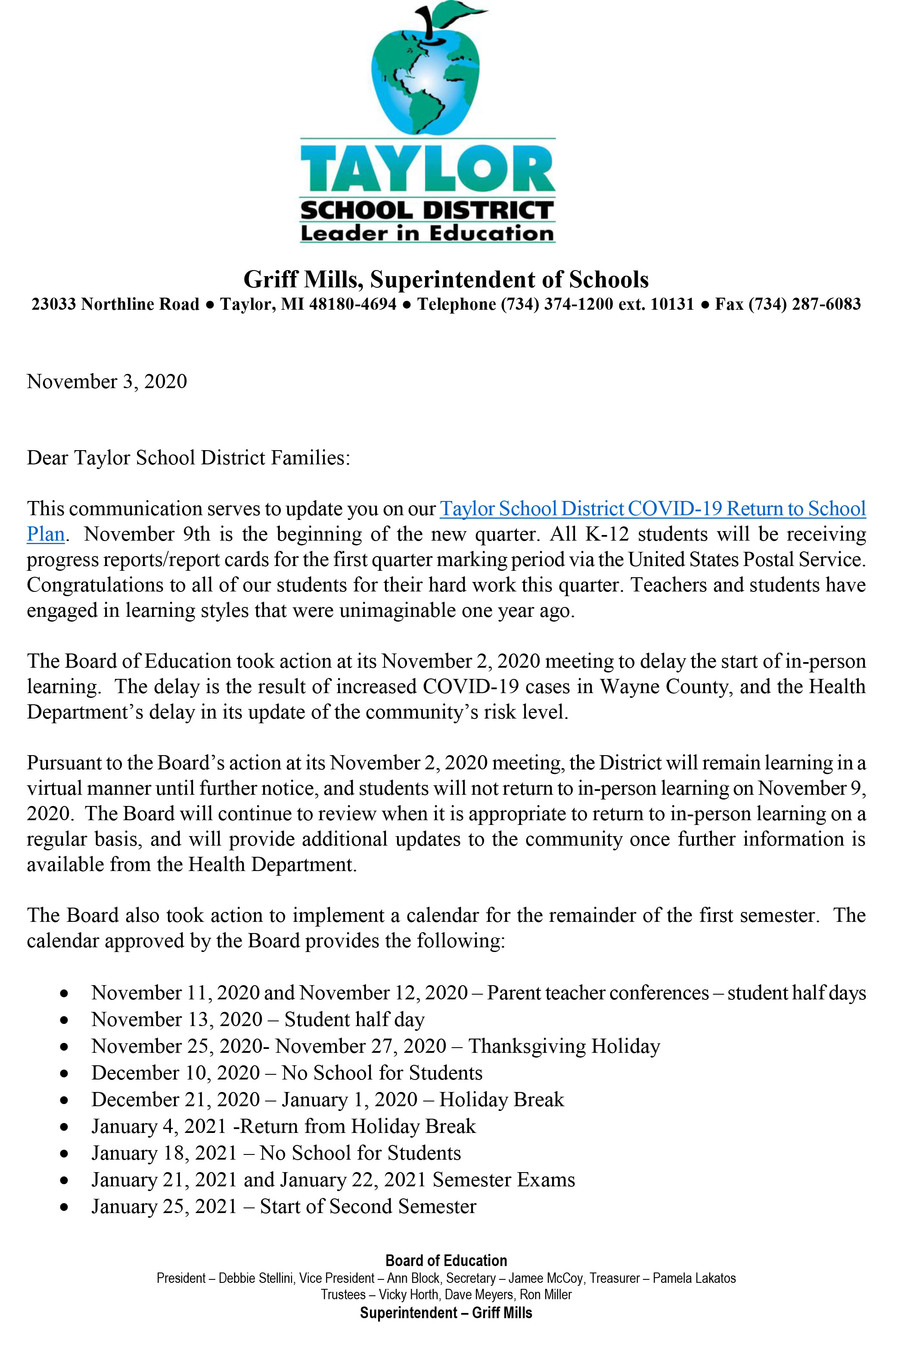 Taylor School District Return to School Plan